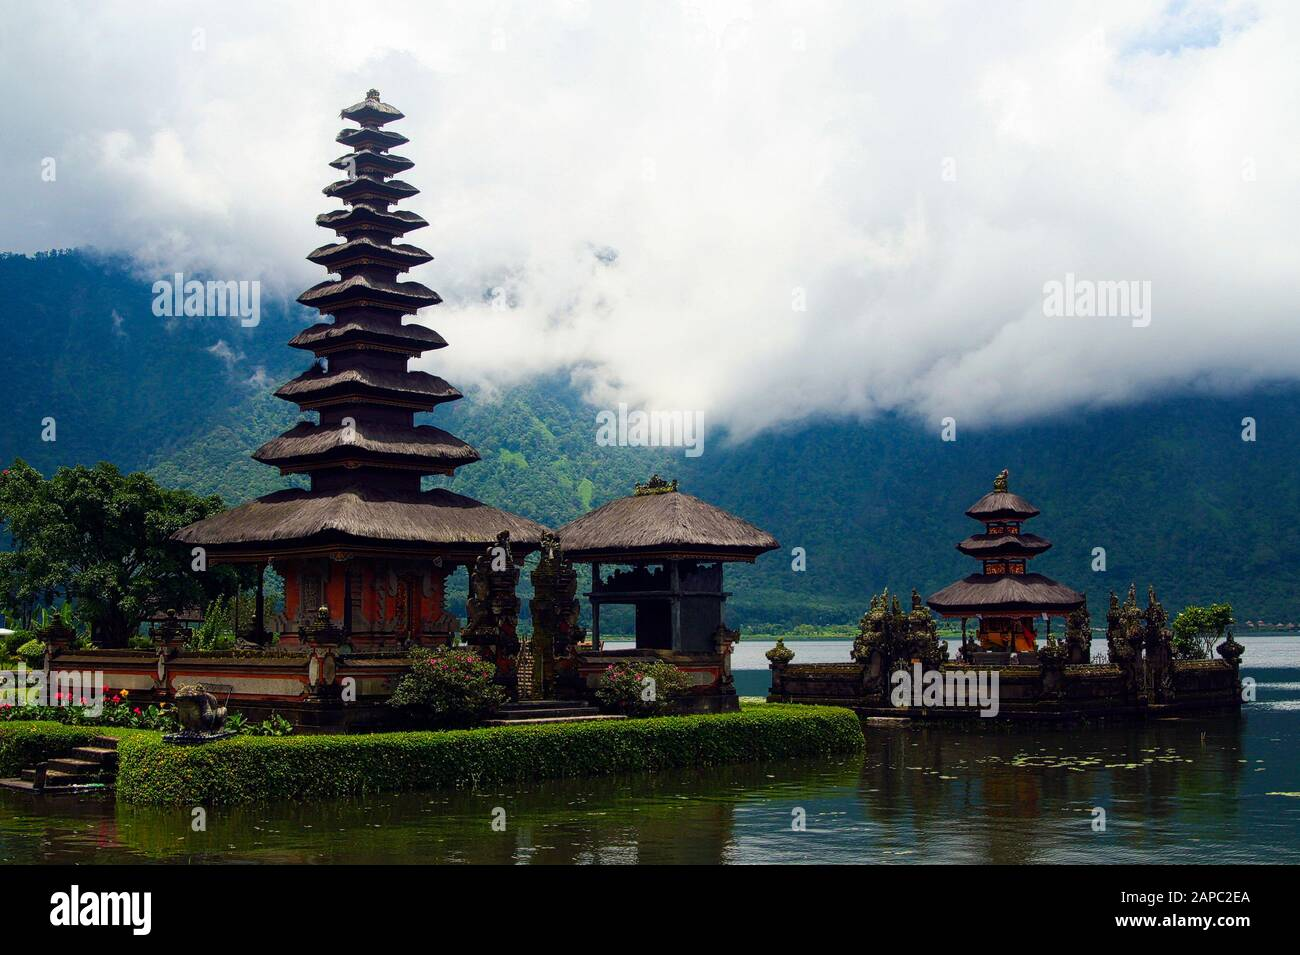 Moody atmosphere with low hanging clouds fog over lake at Pura Ulun Danu Batur temple on Bratan lake - Bali Stock Photo